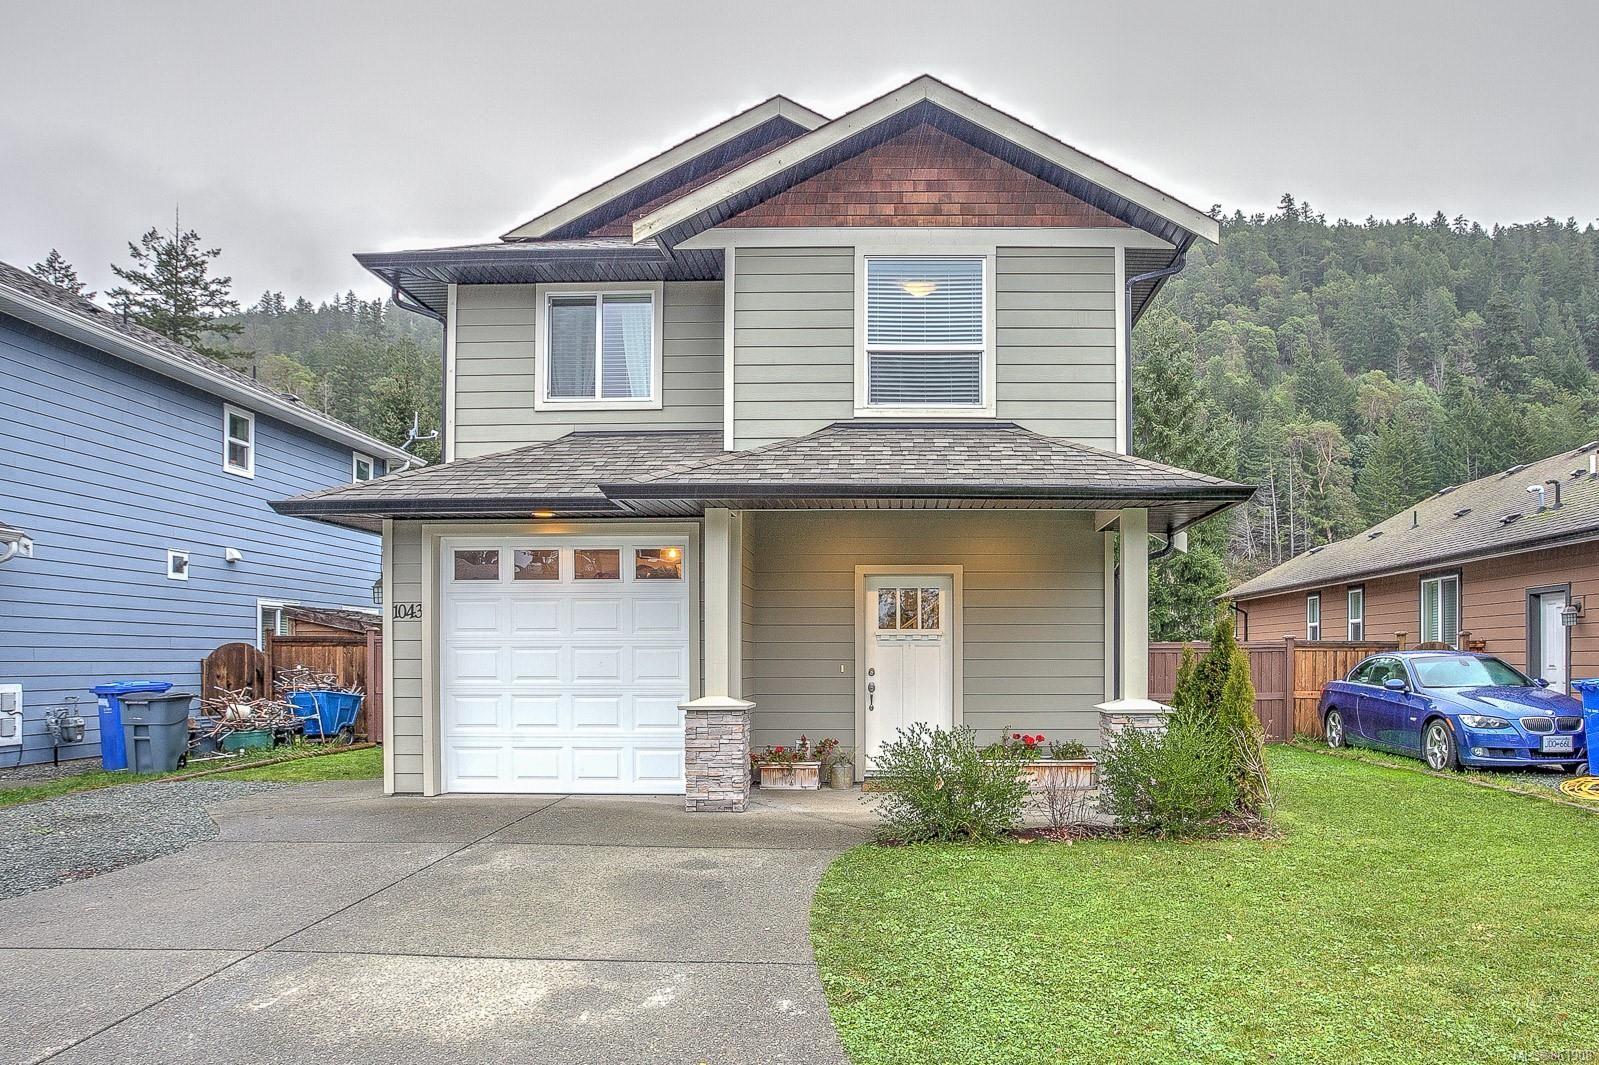 Main Photo: 1043 Skylar Cir in : ML Shawnigan House for sale (Malahat & Area)  : MLS®# 861908